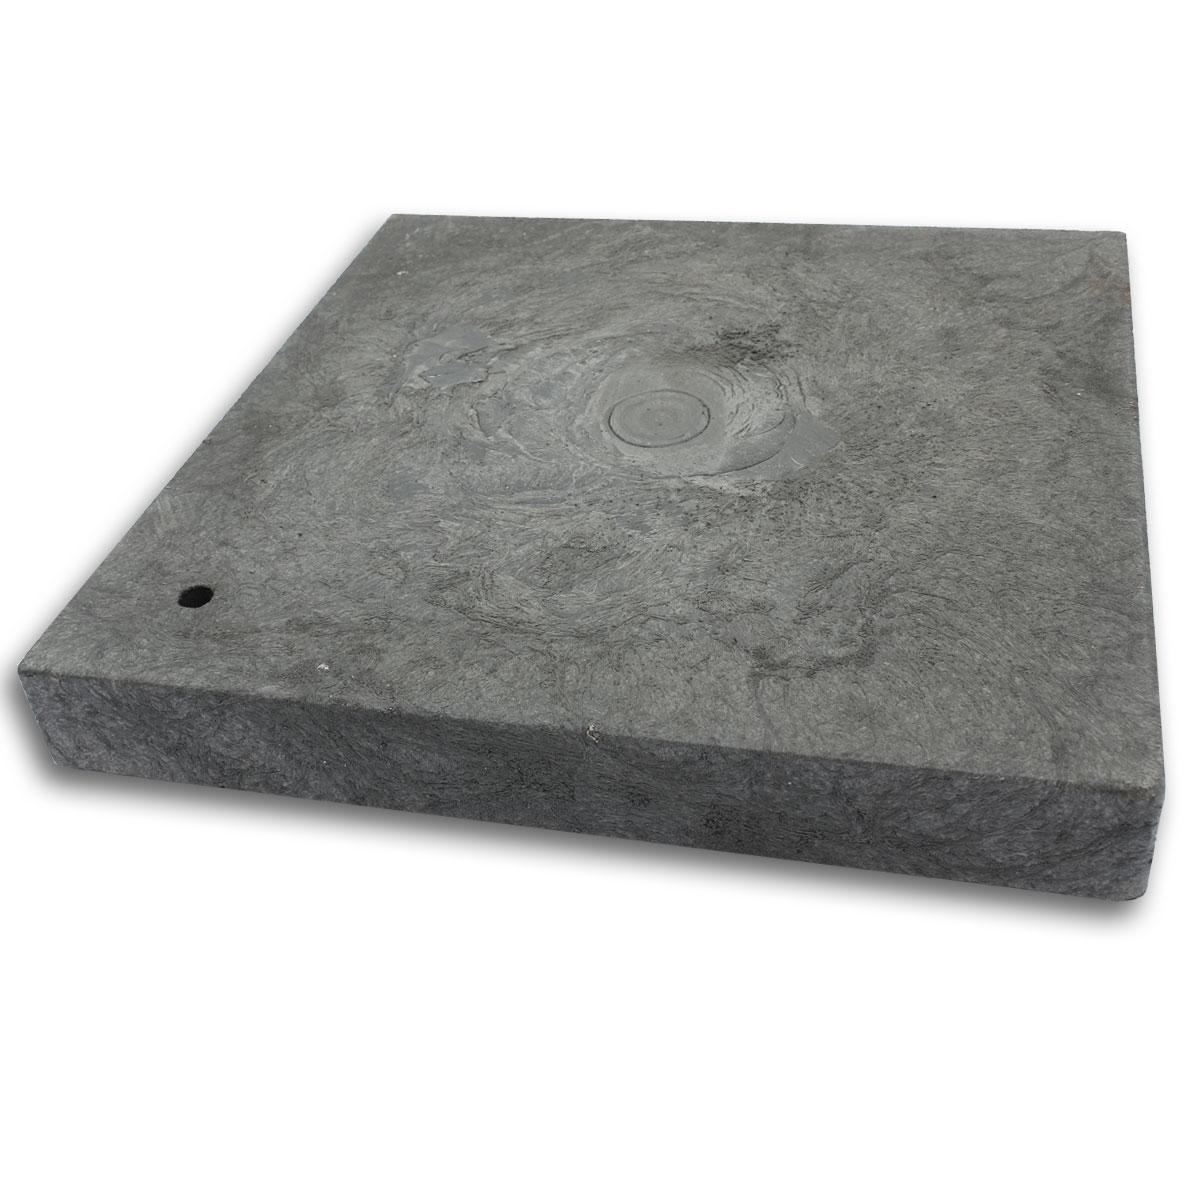 Unterbauplatten - 5cm